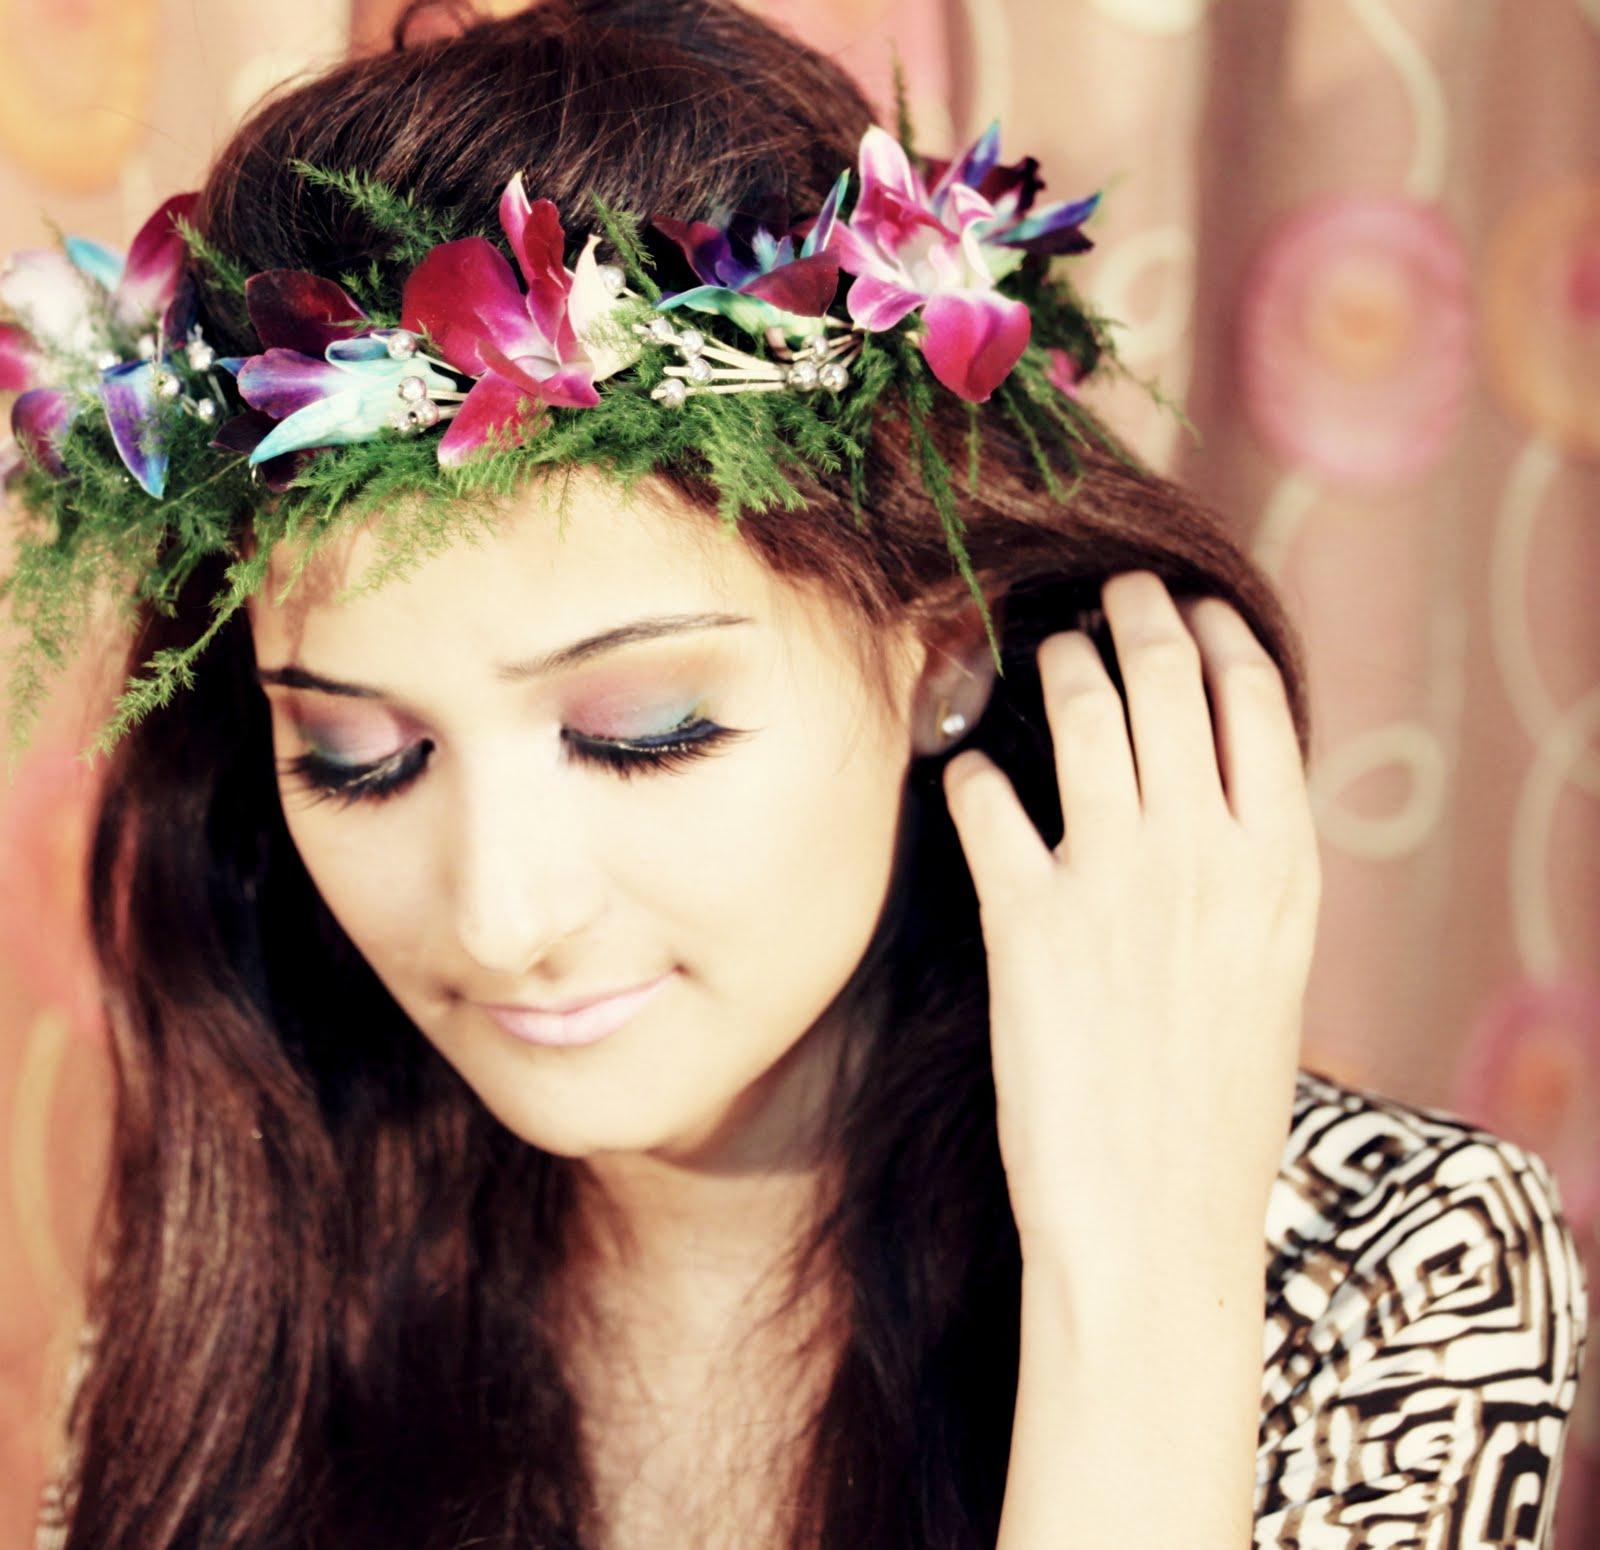 Cute Girl Babies Wallpapers For Facebook Profile Flower Crown Girls Girls